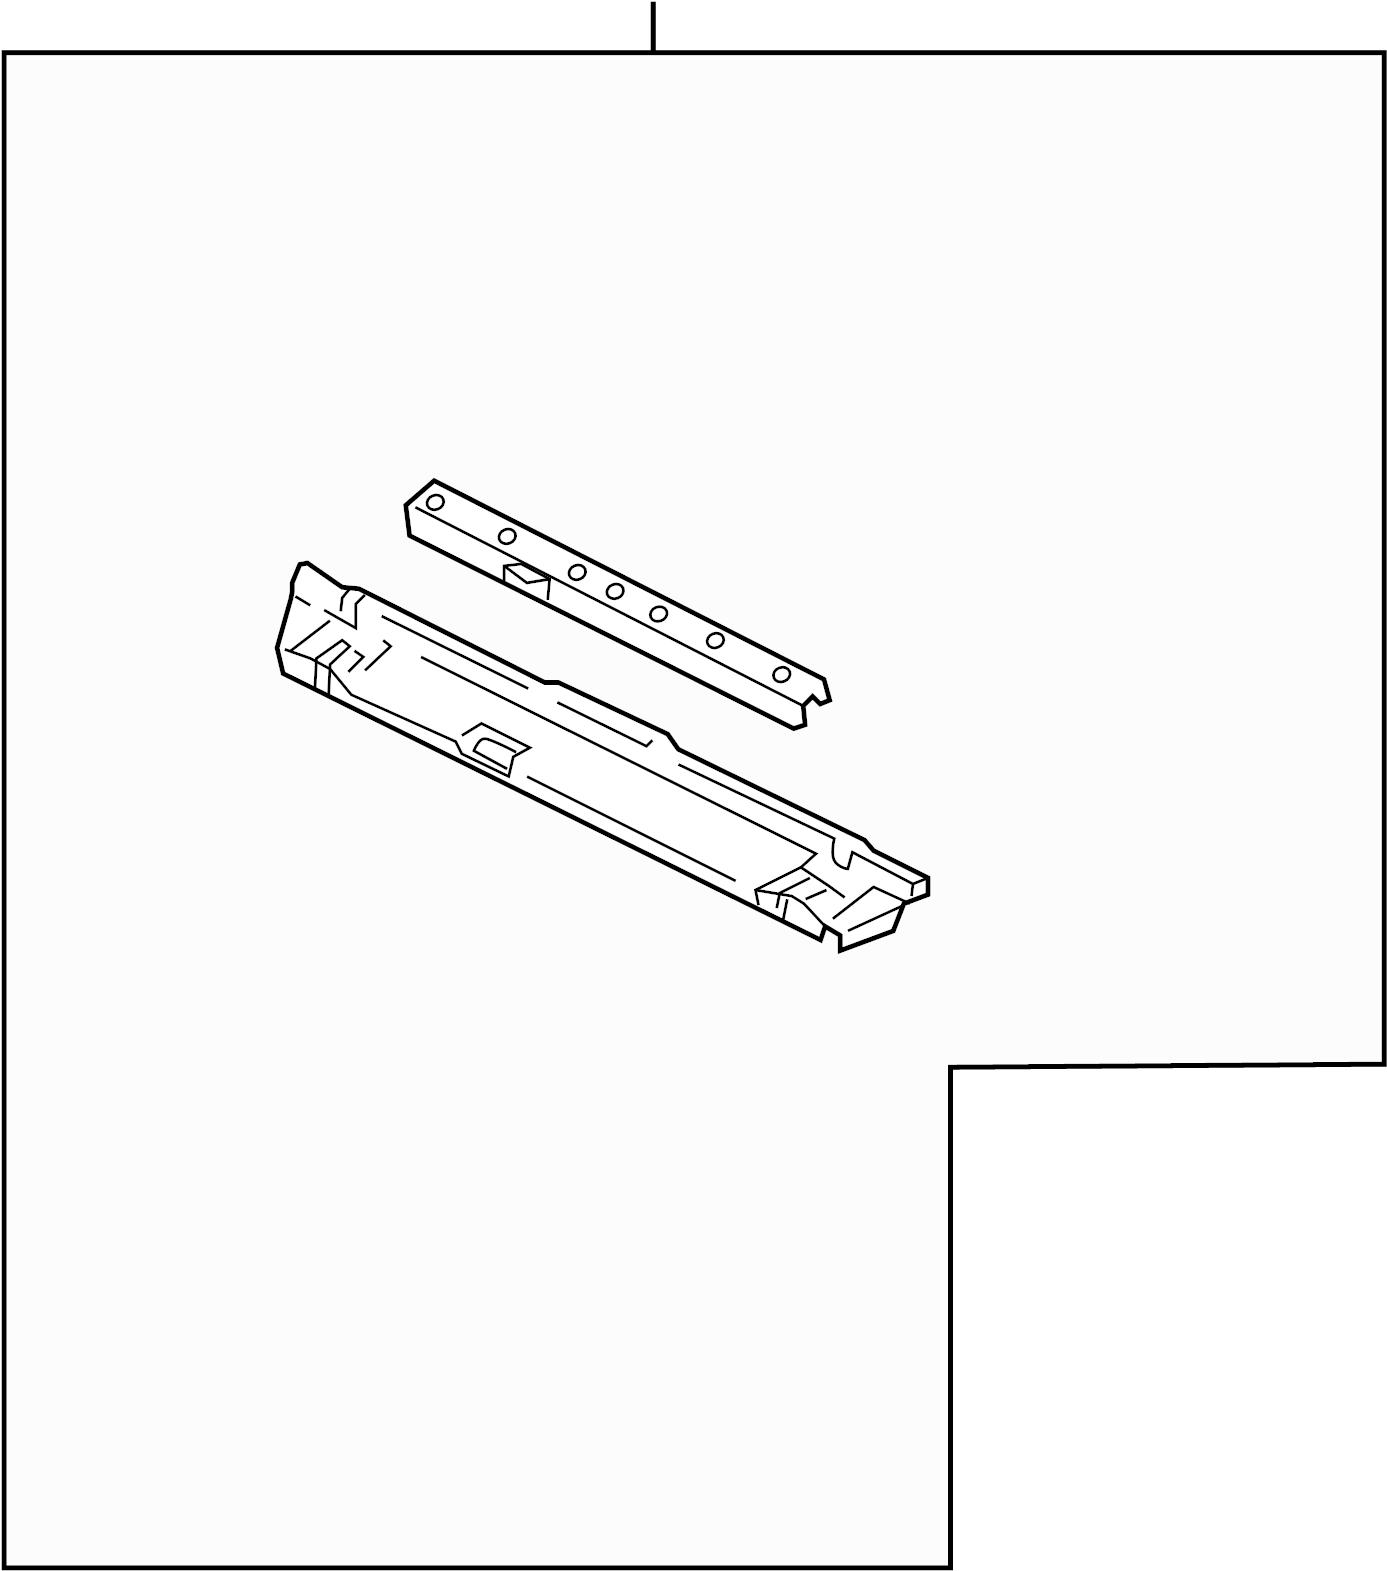 hight resolution of 2000 pontiac montana fuse box diagram 2004 pontiac montana engine diagram pontiac montana sv6 panel panel asm f